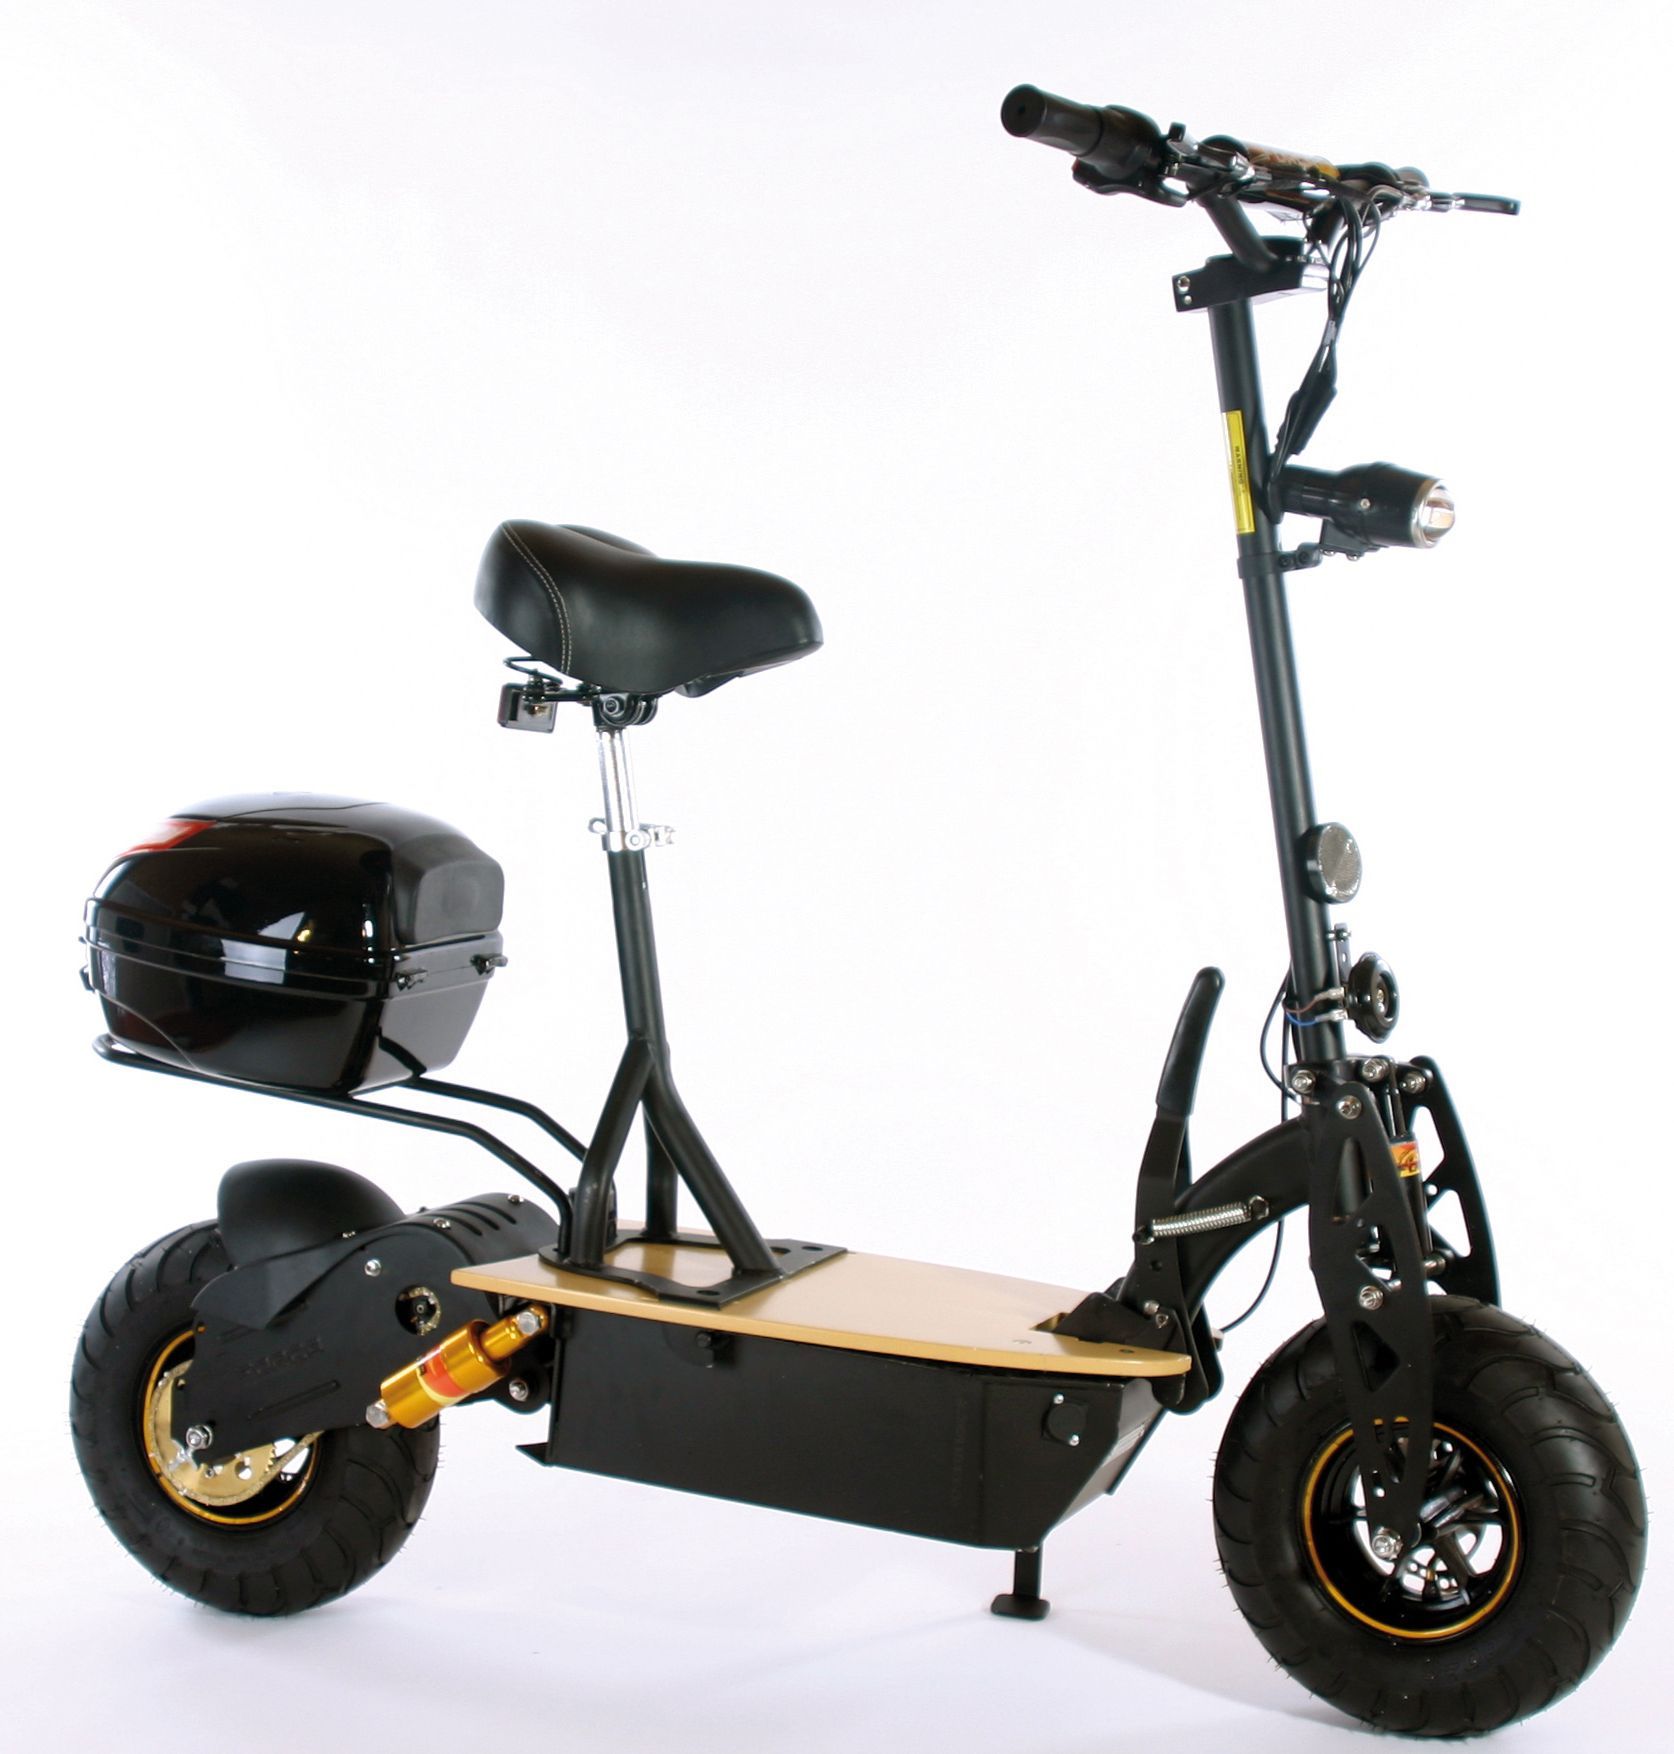 DIDI THURAU EDITION Didi Thurau Edition Elektro-Roller Eco-City-Liner, 45 km/h, »Speed Safety Plus«